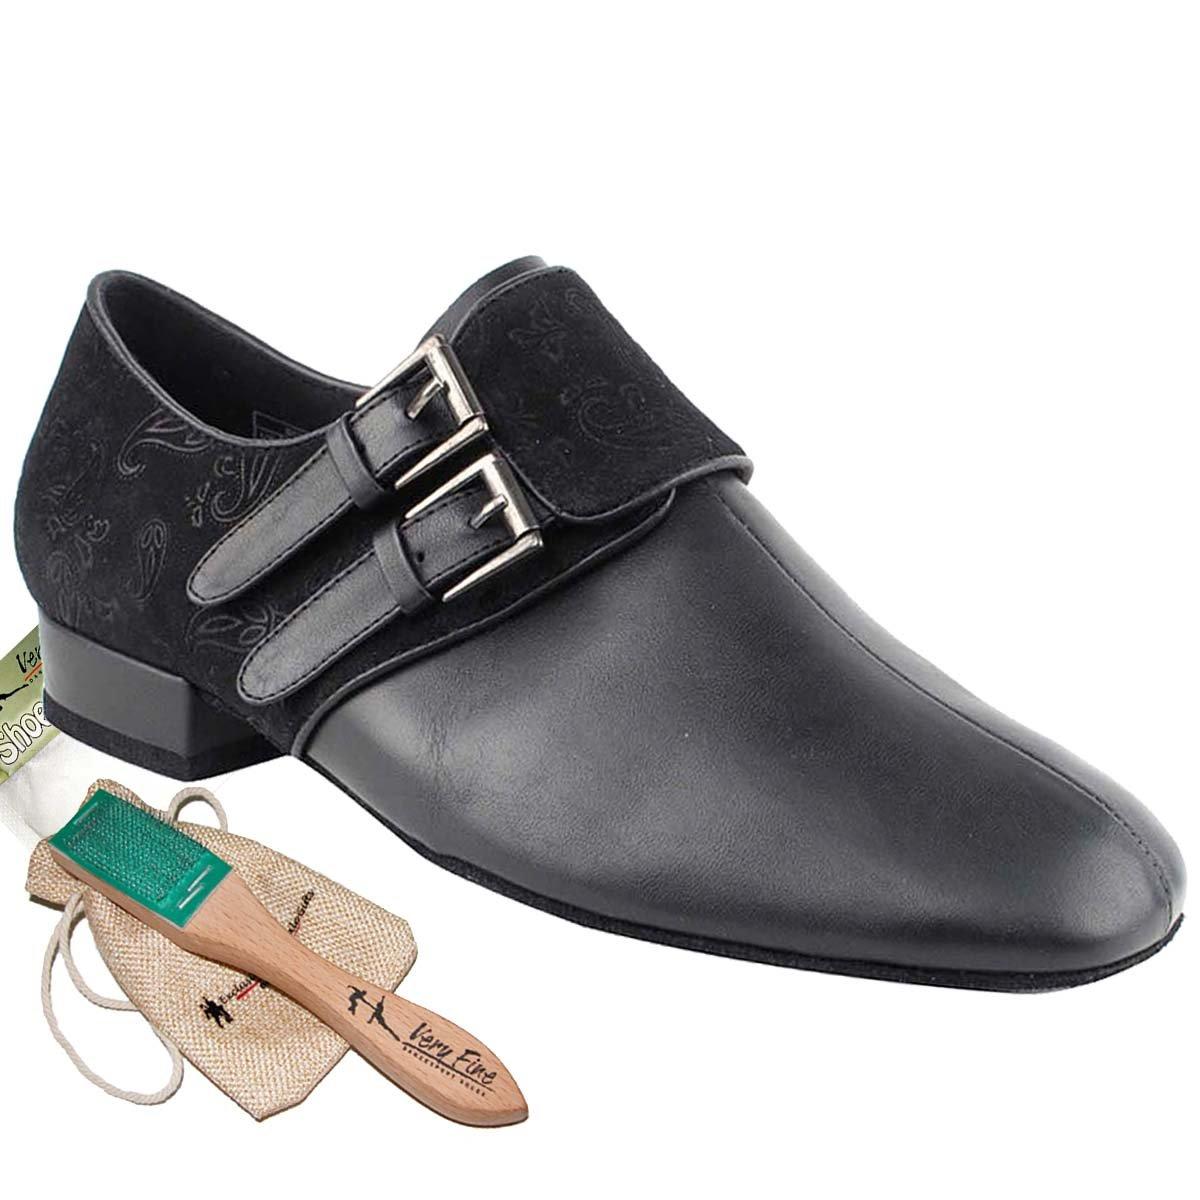 Mens Ballroom Dance Shoes Standard & Smooth Tango Wedding Salsa Dance Shoes Black Leather & Nubuck CD9006AEB Comfortable - Very Fine 1'' Heel 12 M US [Bundle of 5]